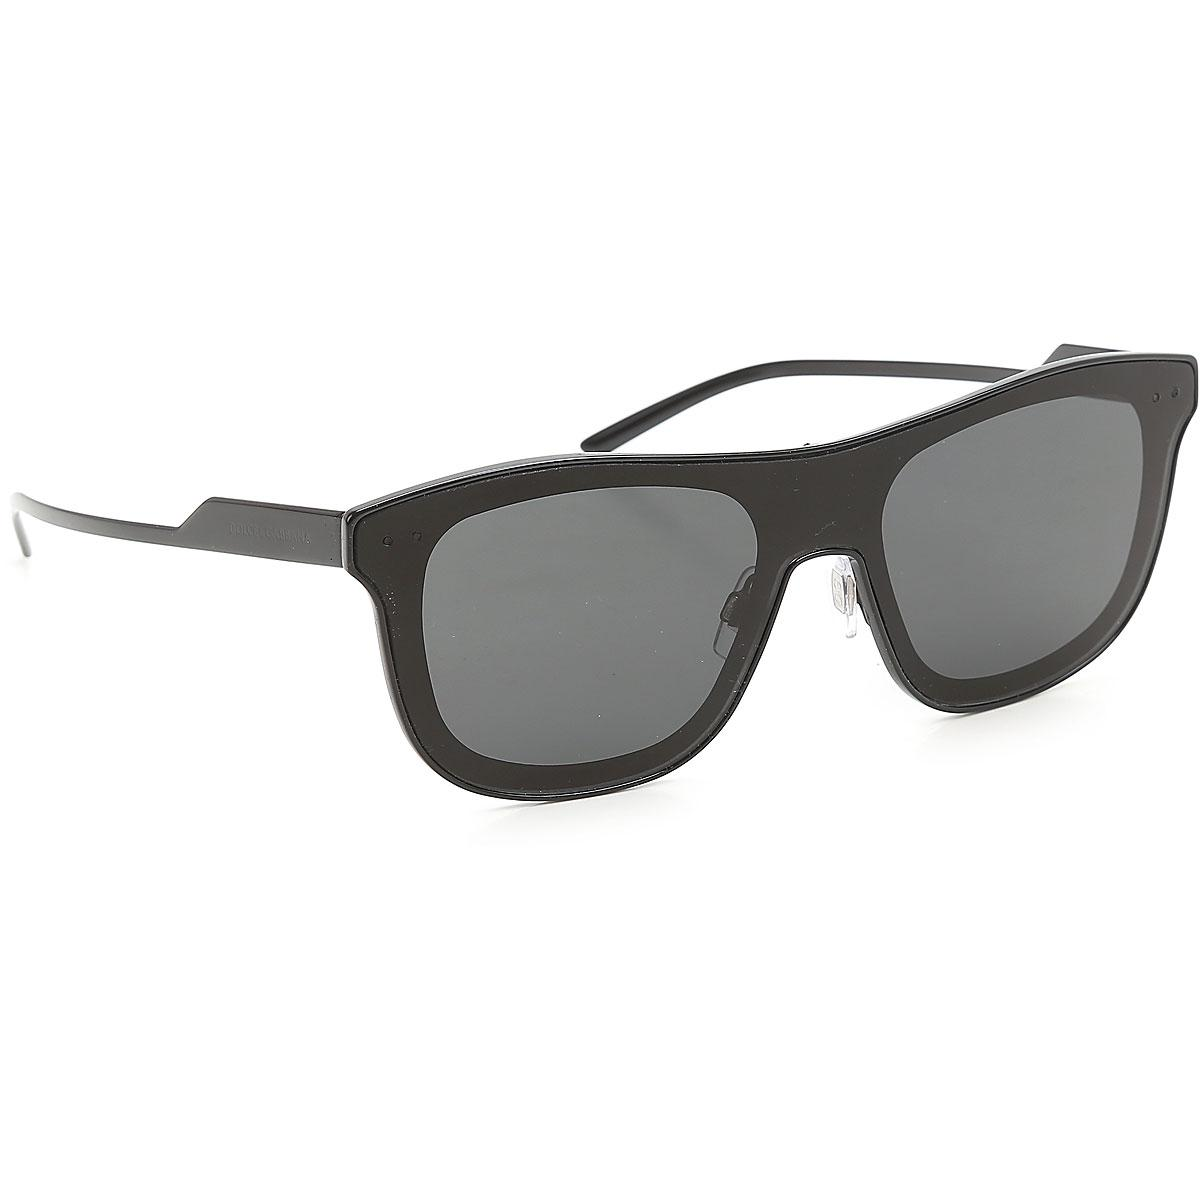 bc77308fd3ce Lyst - Dolce & Gabbana Sunglasses On Sale in Black for Men